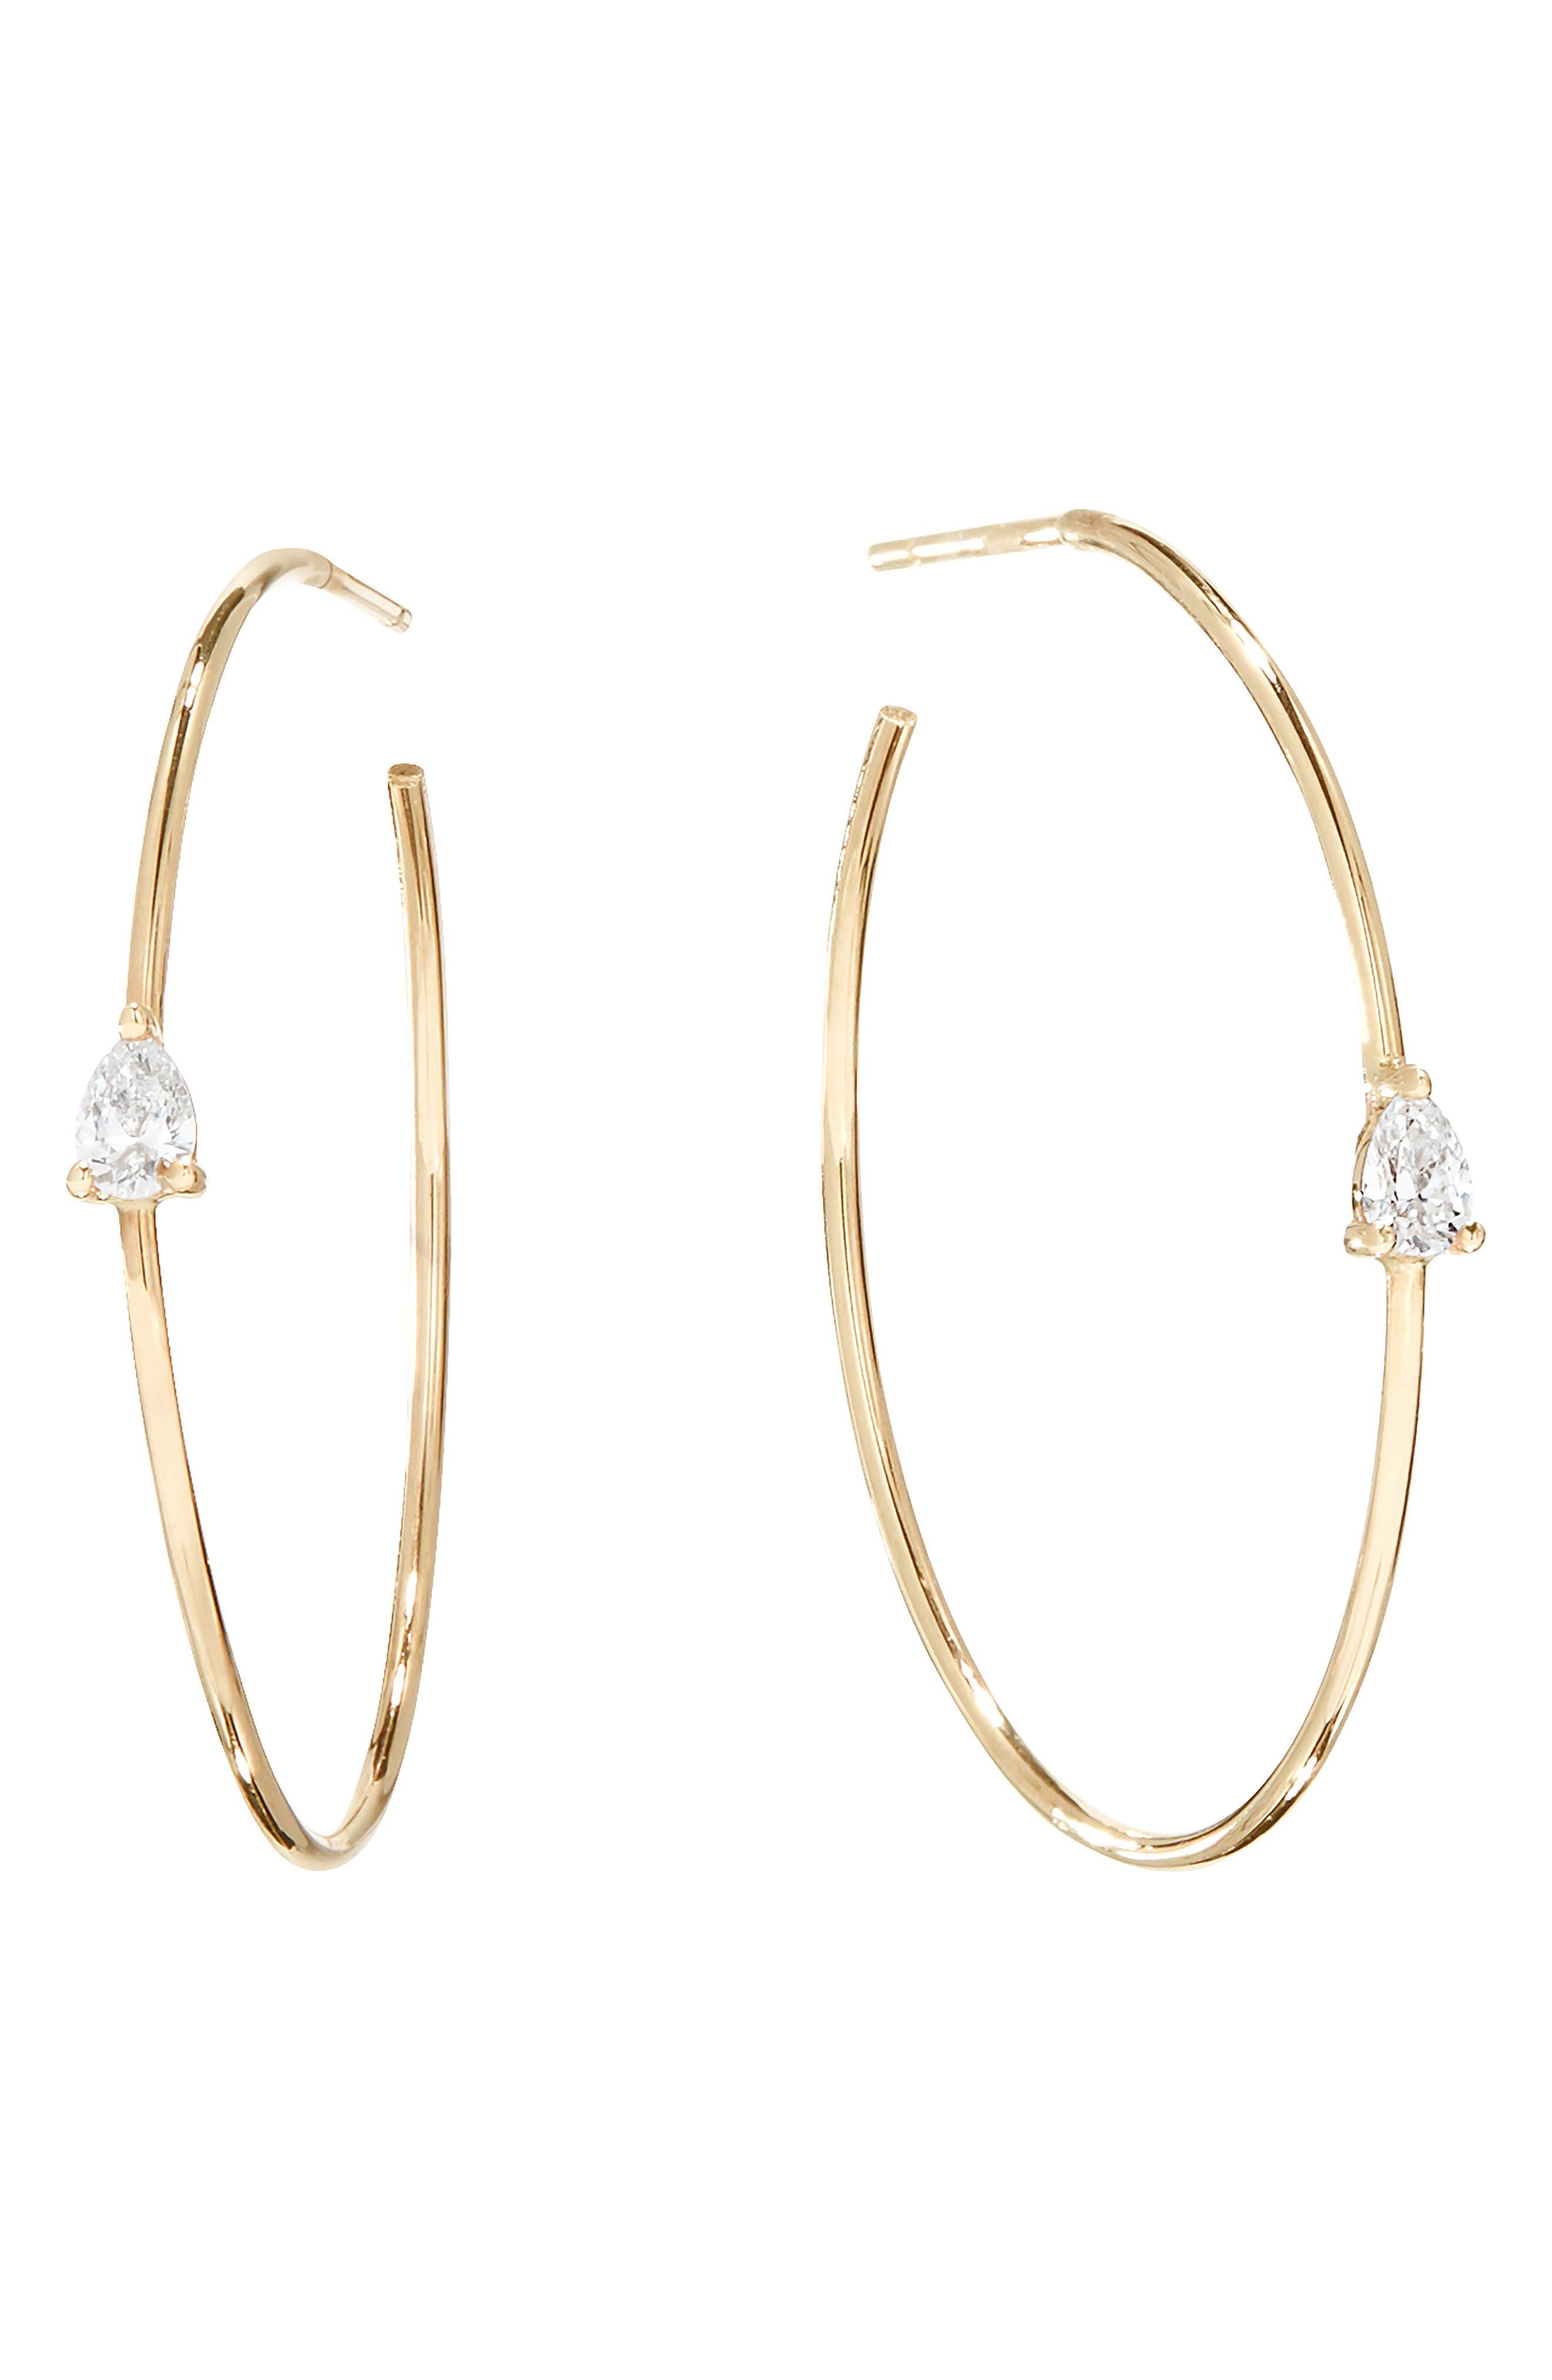 Pear Diamond Hoop Earrings,                         Main,                         color, GOLD